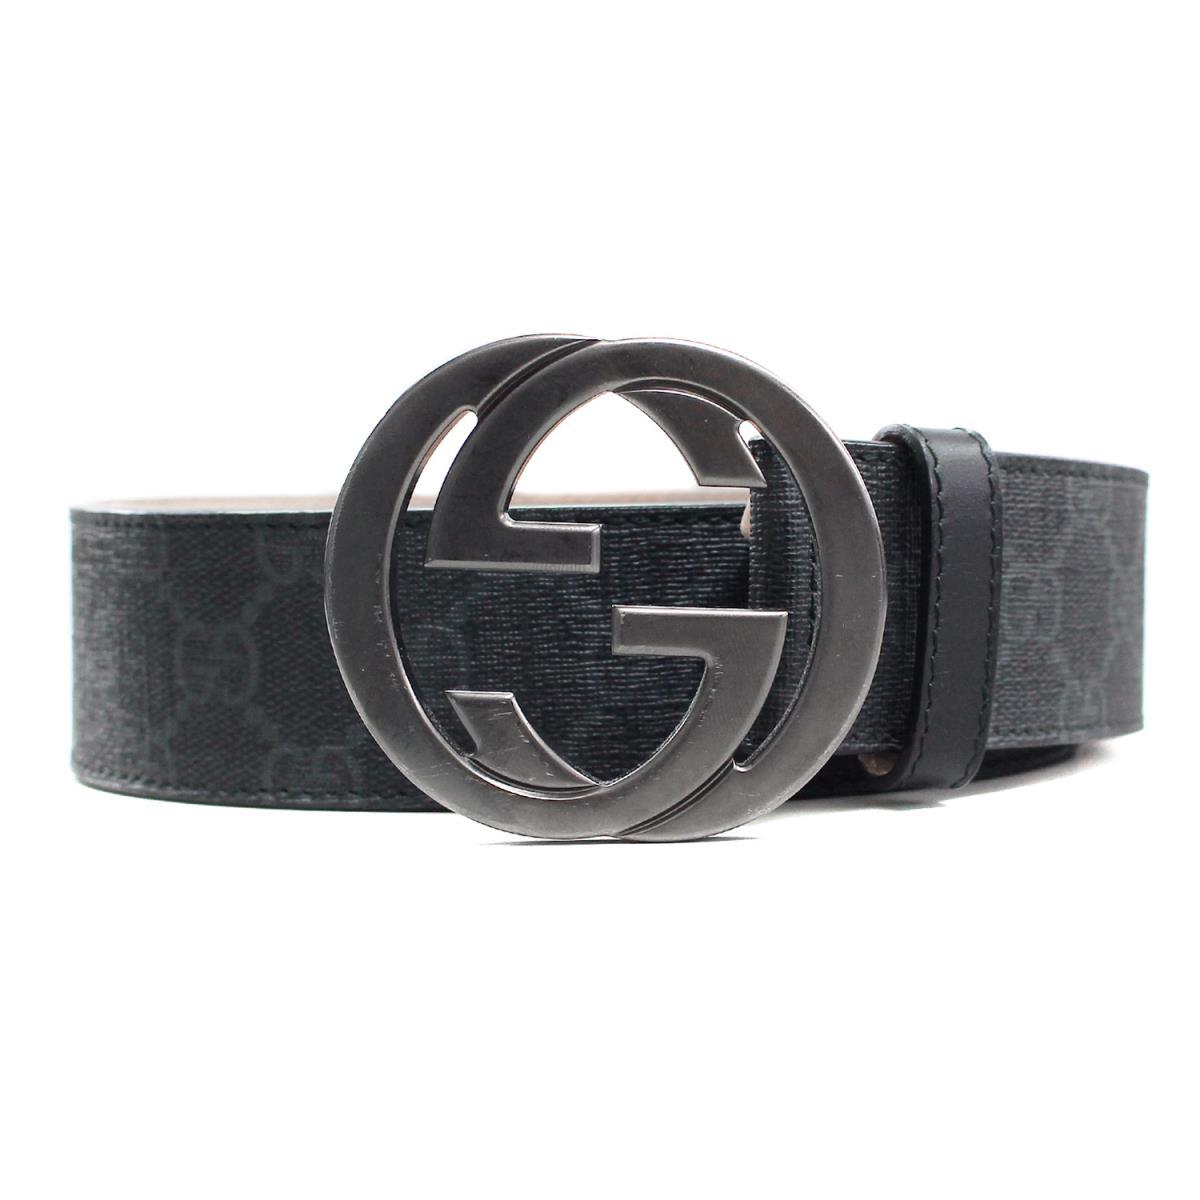 b7351763ce0 GUCCI (Gucci) GG buckle interlocking grip GG monogram belt (CINTURA GG  SUPREME) black 90 36